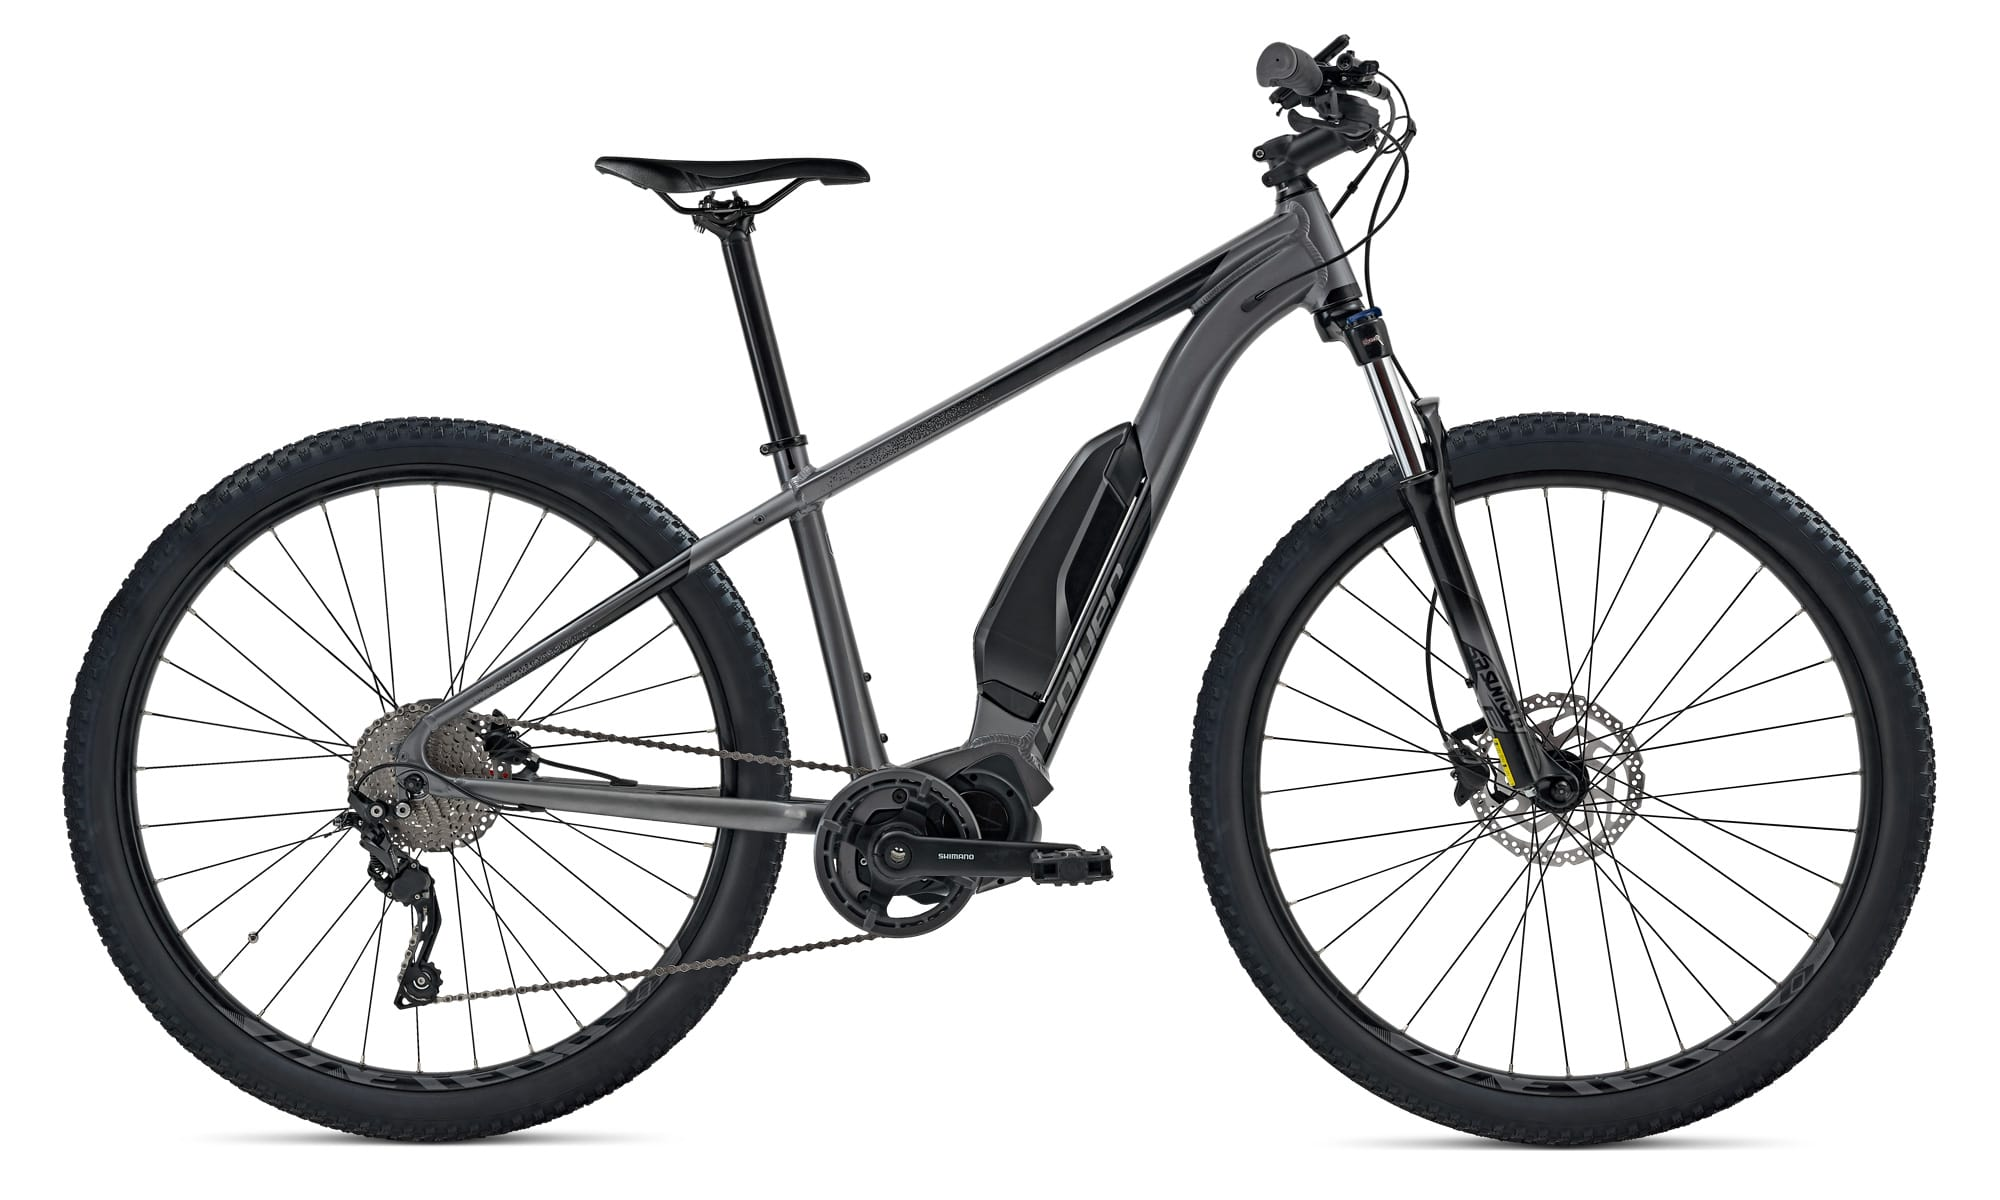 Mid Drive Electric Hybrid Bike Coluer Quickvolt Grey